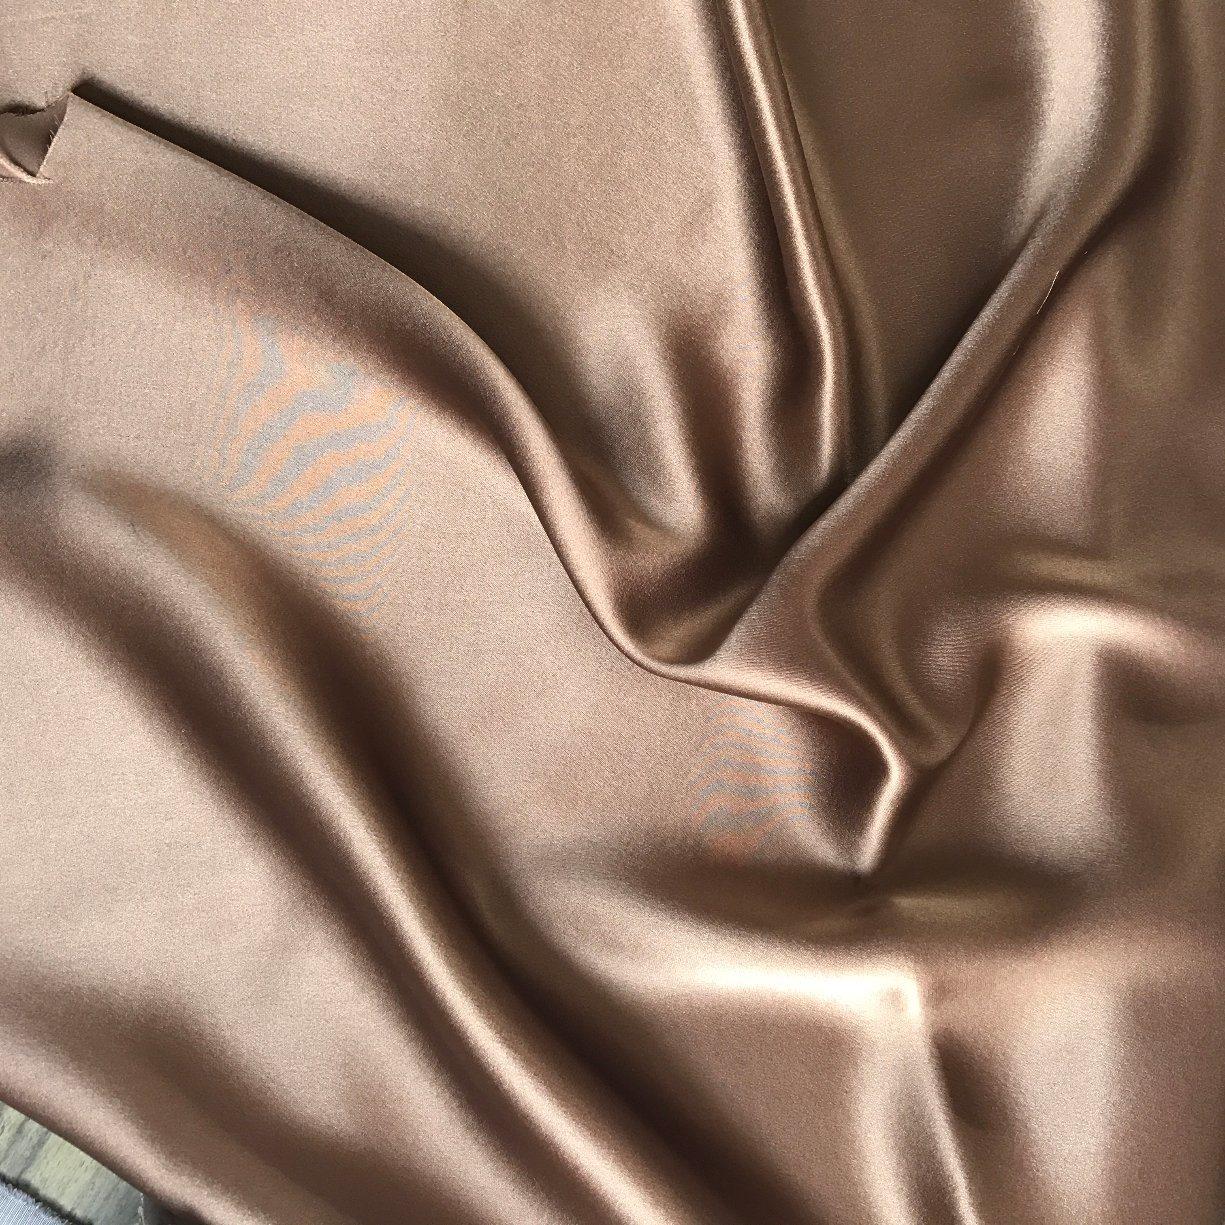 New 19mm Silk Satin Fabric, Silk Charmeuse Fabric, Silk Fabric, Silk Stretch Satin Fabric, Silk Stretch Charmeuse Fabric